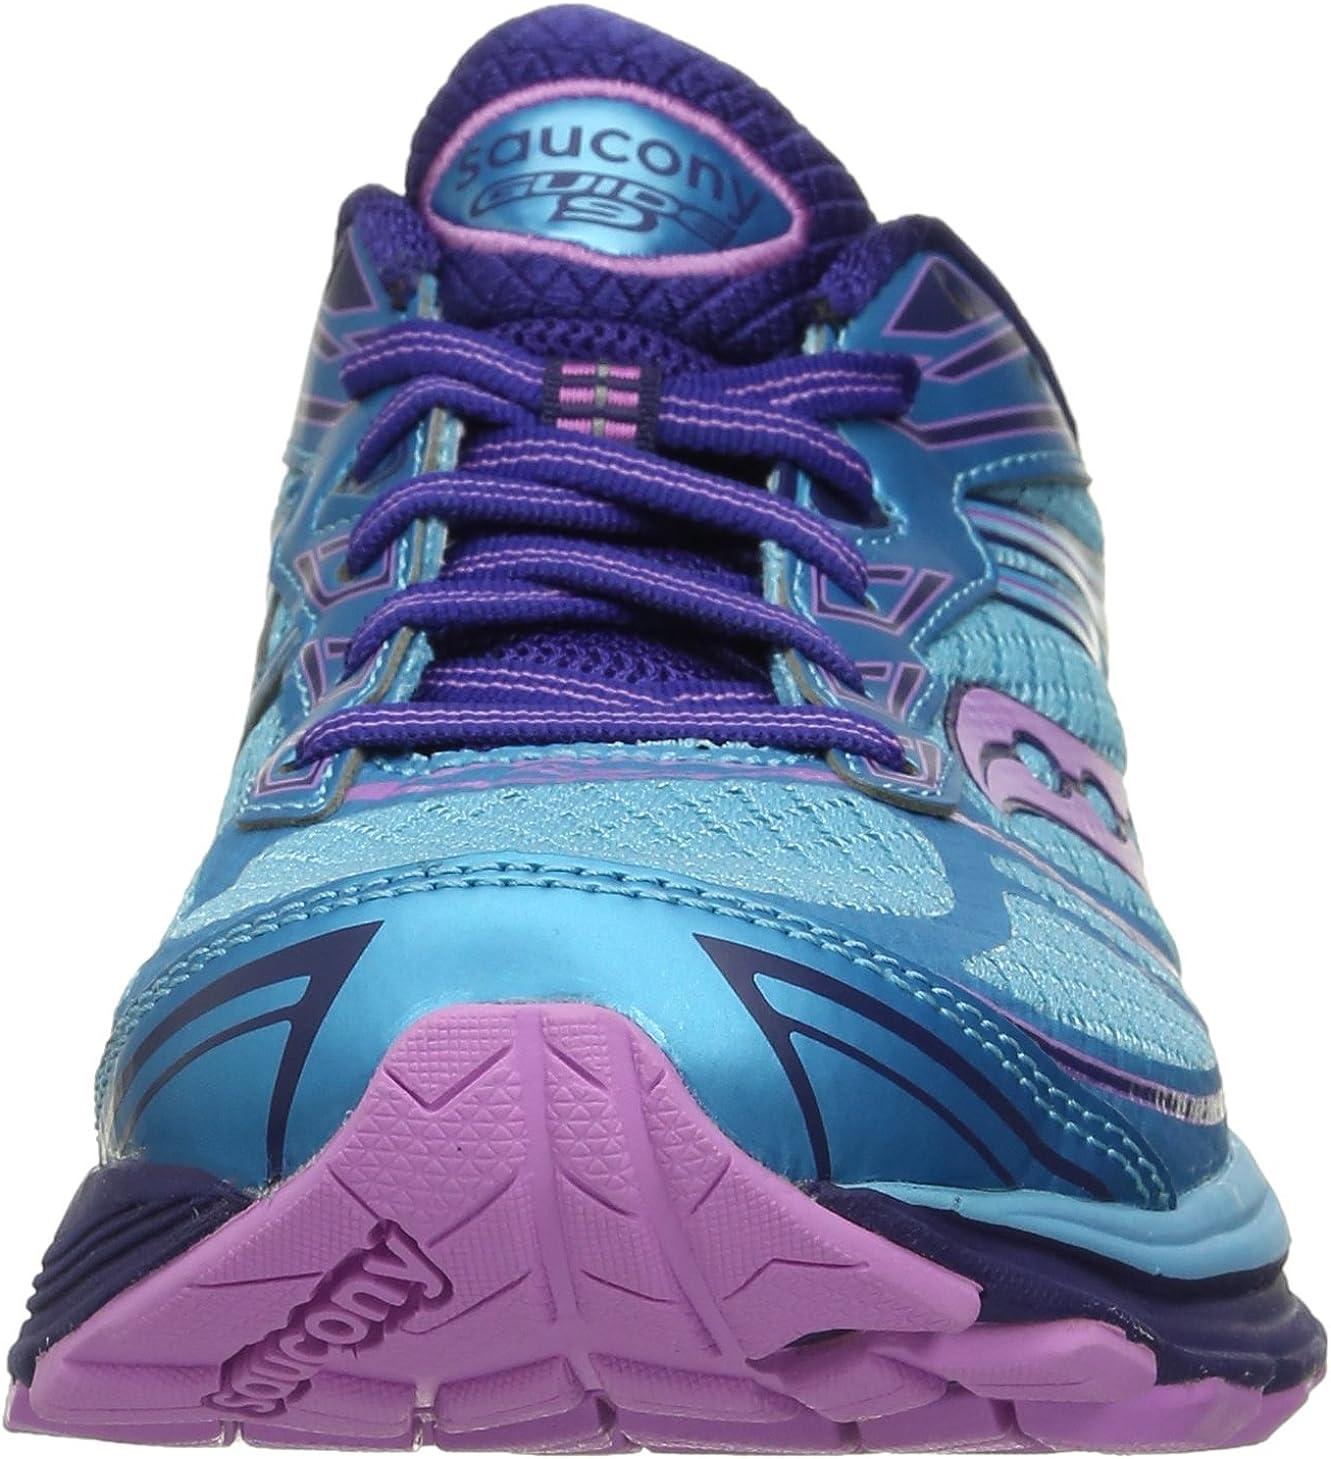 Saucony Women s Guide 9 Running Shoe